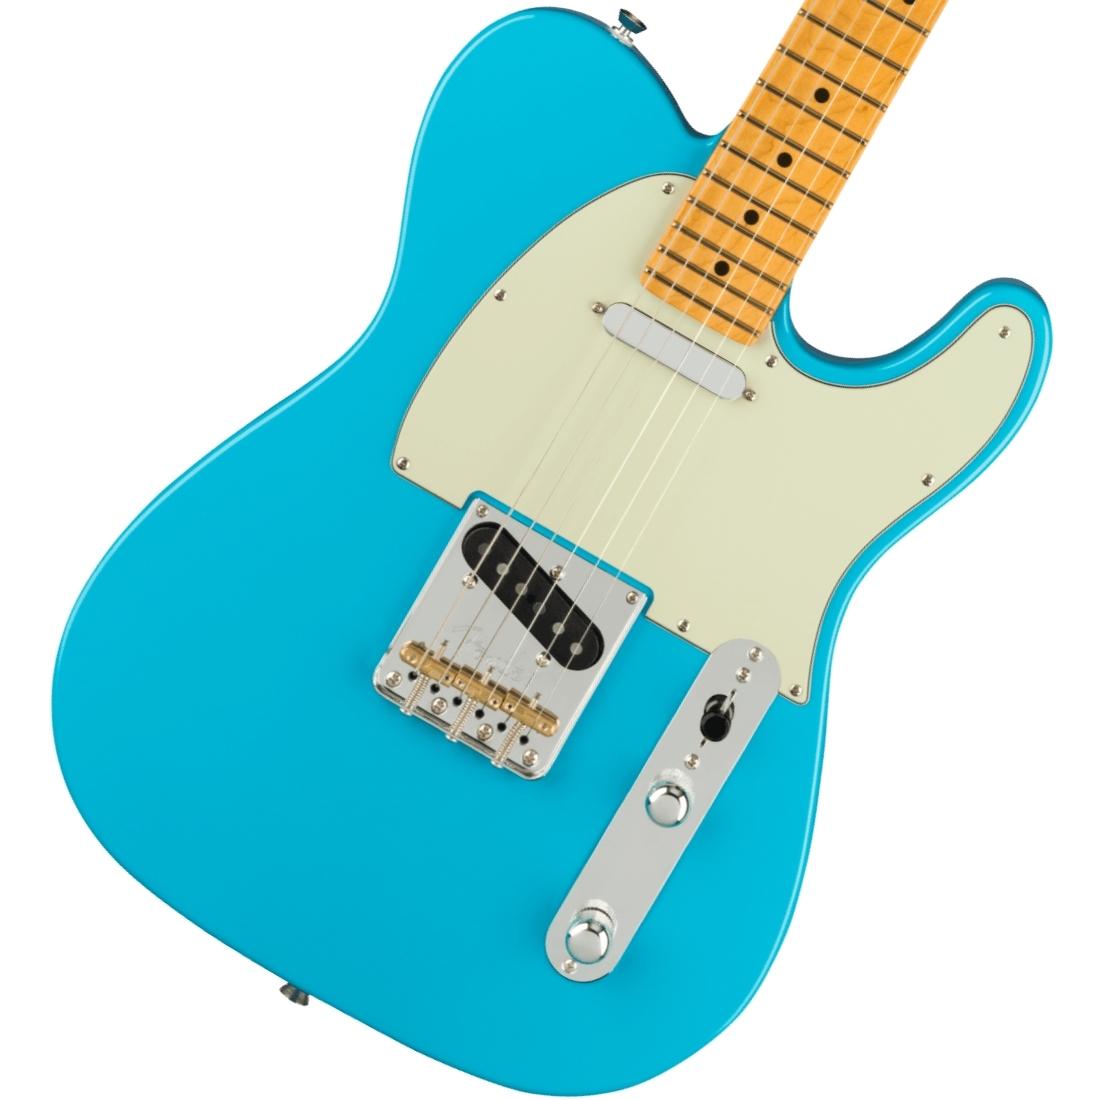 Fender/ American Professional II Telecaster Maple Fingerboard Miami Blue フェンダー【新品特価】《純正ケーブル&ピック1ダースプレゼント!/+2306619444005》【YRK】《純正ギグケースプレゼント!/+0885978806249》